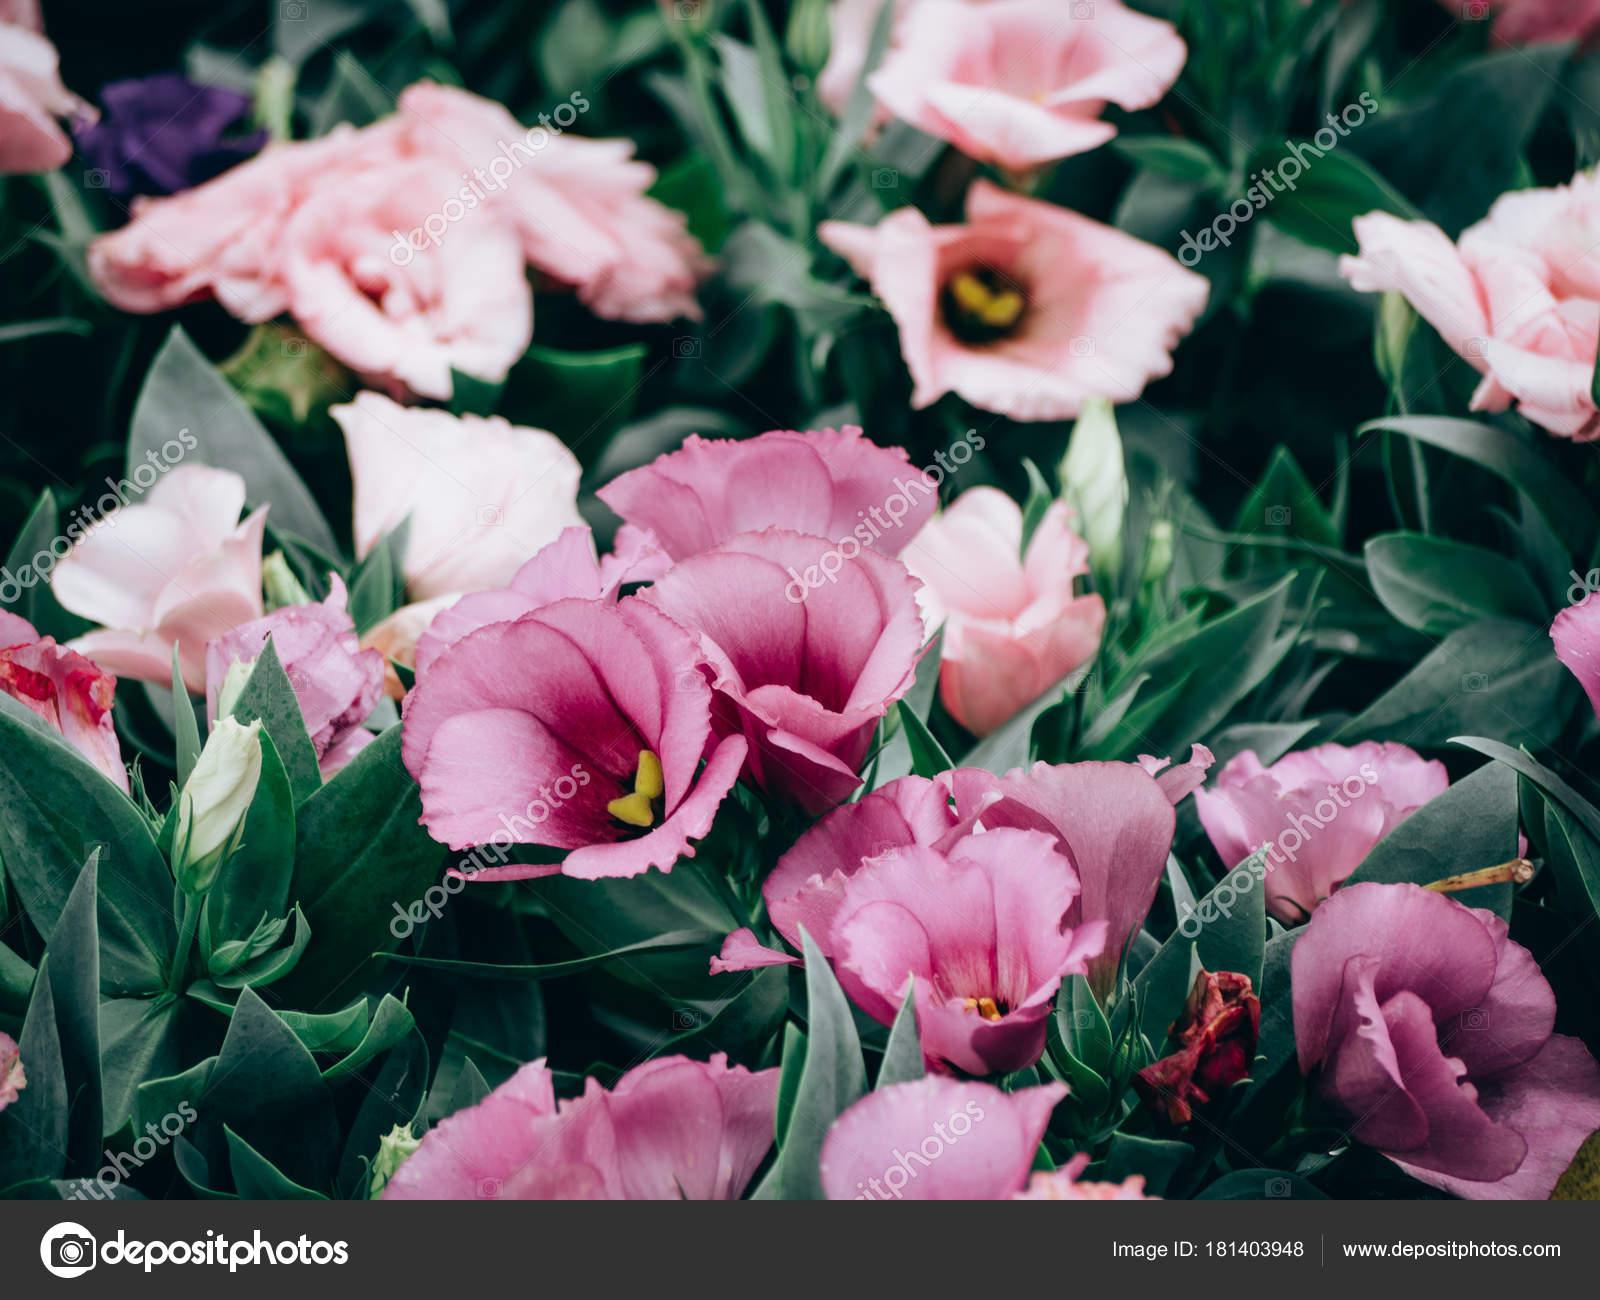 nahaufnahme der lisianthus oder eustoma bl tenpflanzen im garten stockfoto pritsadee 181403948. Black Bedroom Furniture Sets. Home Design Ideas